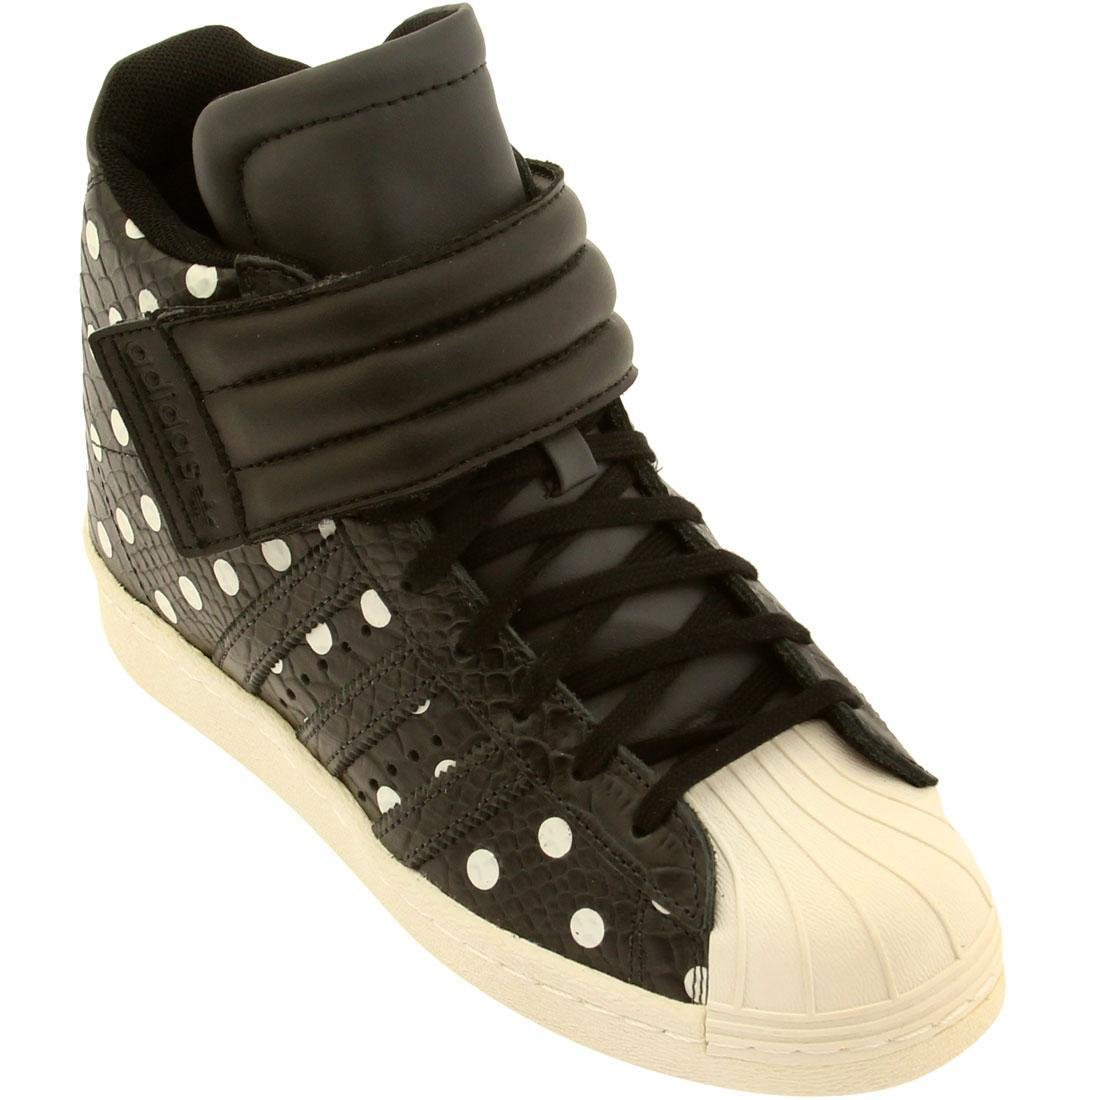 Womens Adidas Superstar Up Bügel Keil Schuhe Kohlenstoff